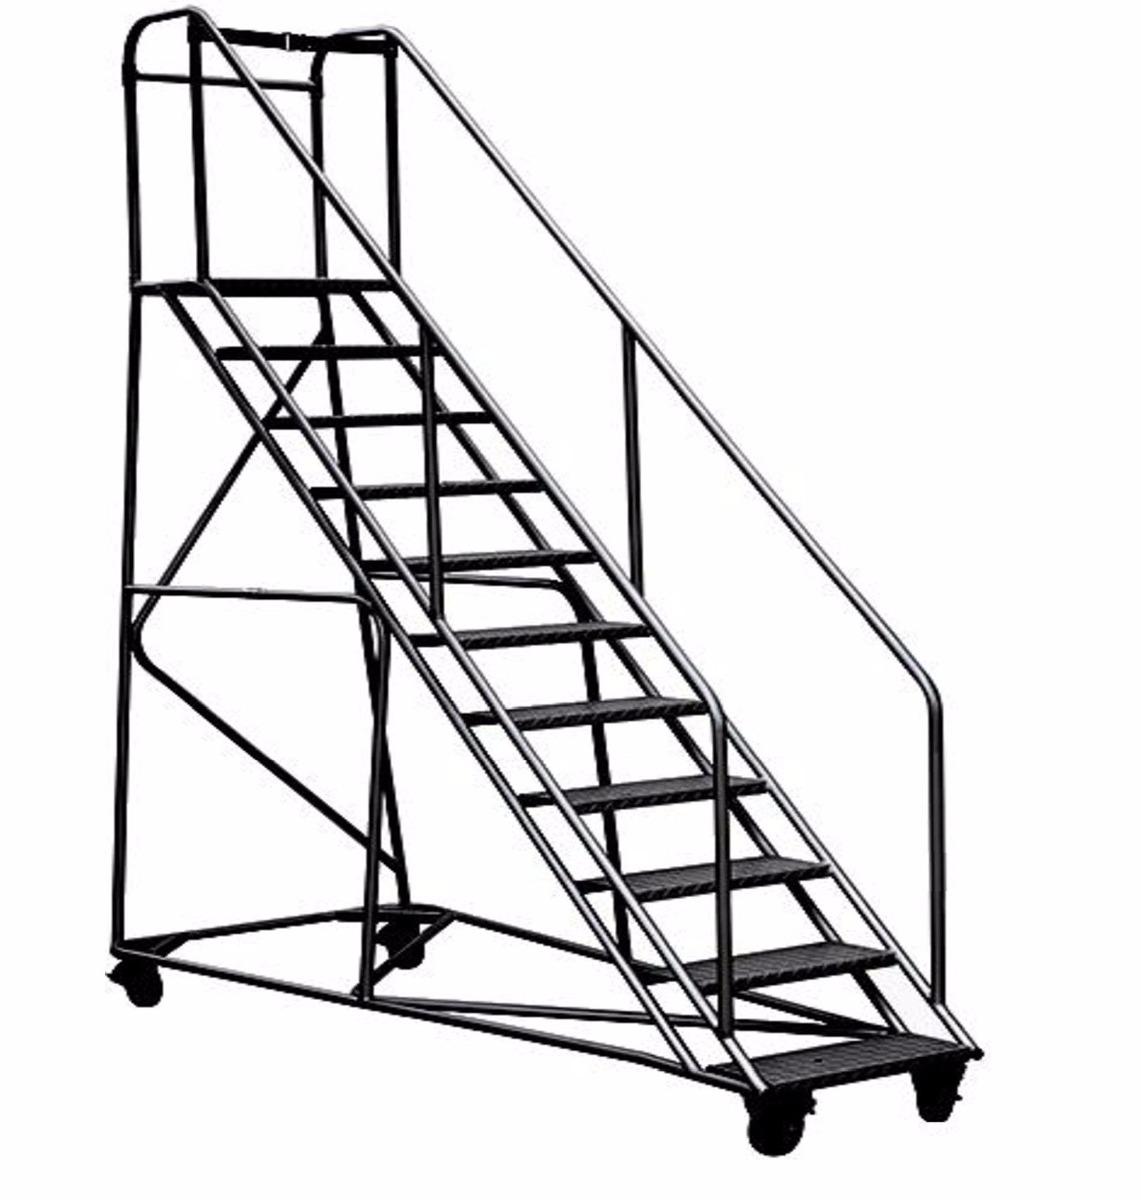 Escalera plataforma tipo avi n en acero 5 pasos mts for Escalera 5 pasos afuera